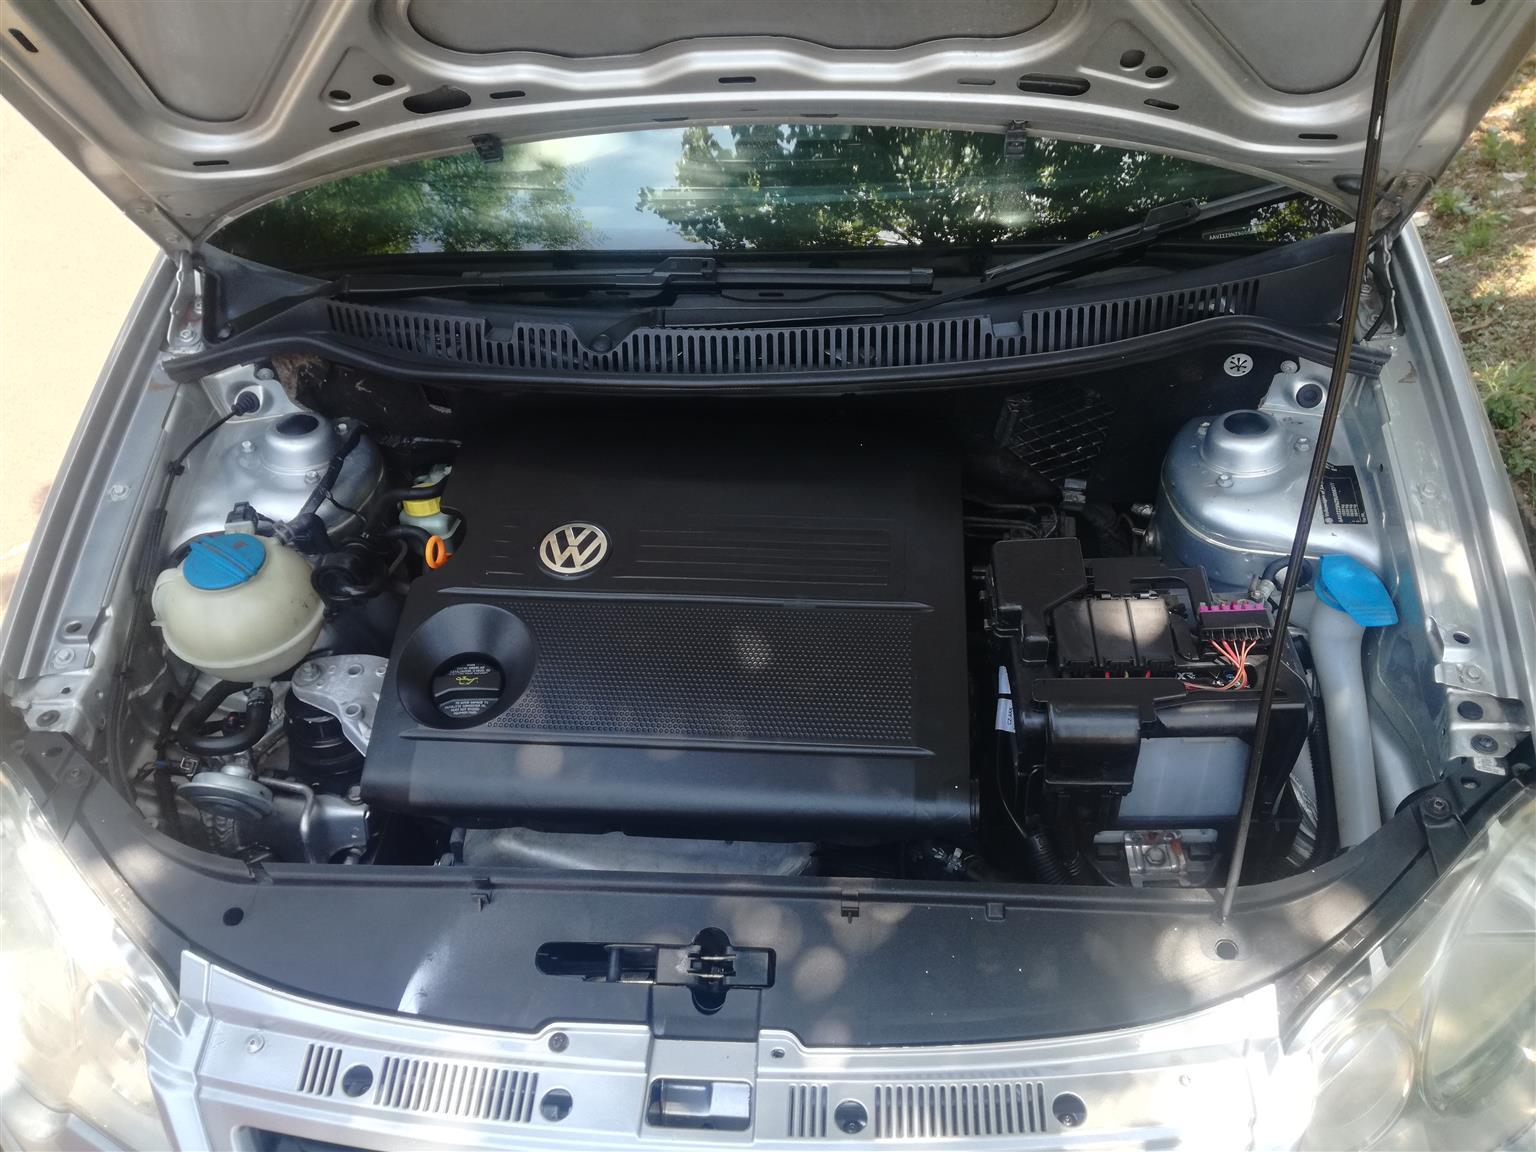 2009 VW Polo Classic 1.6 Comfortline